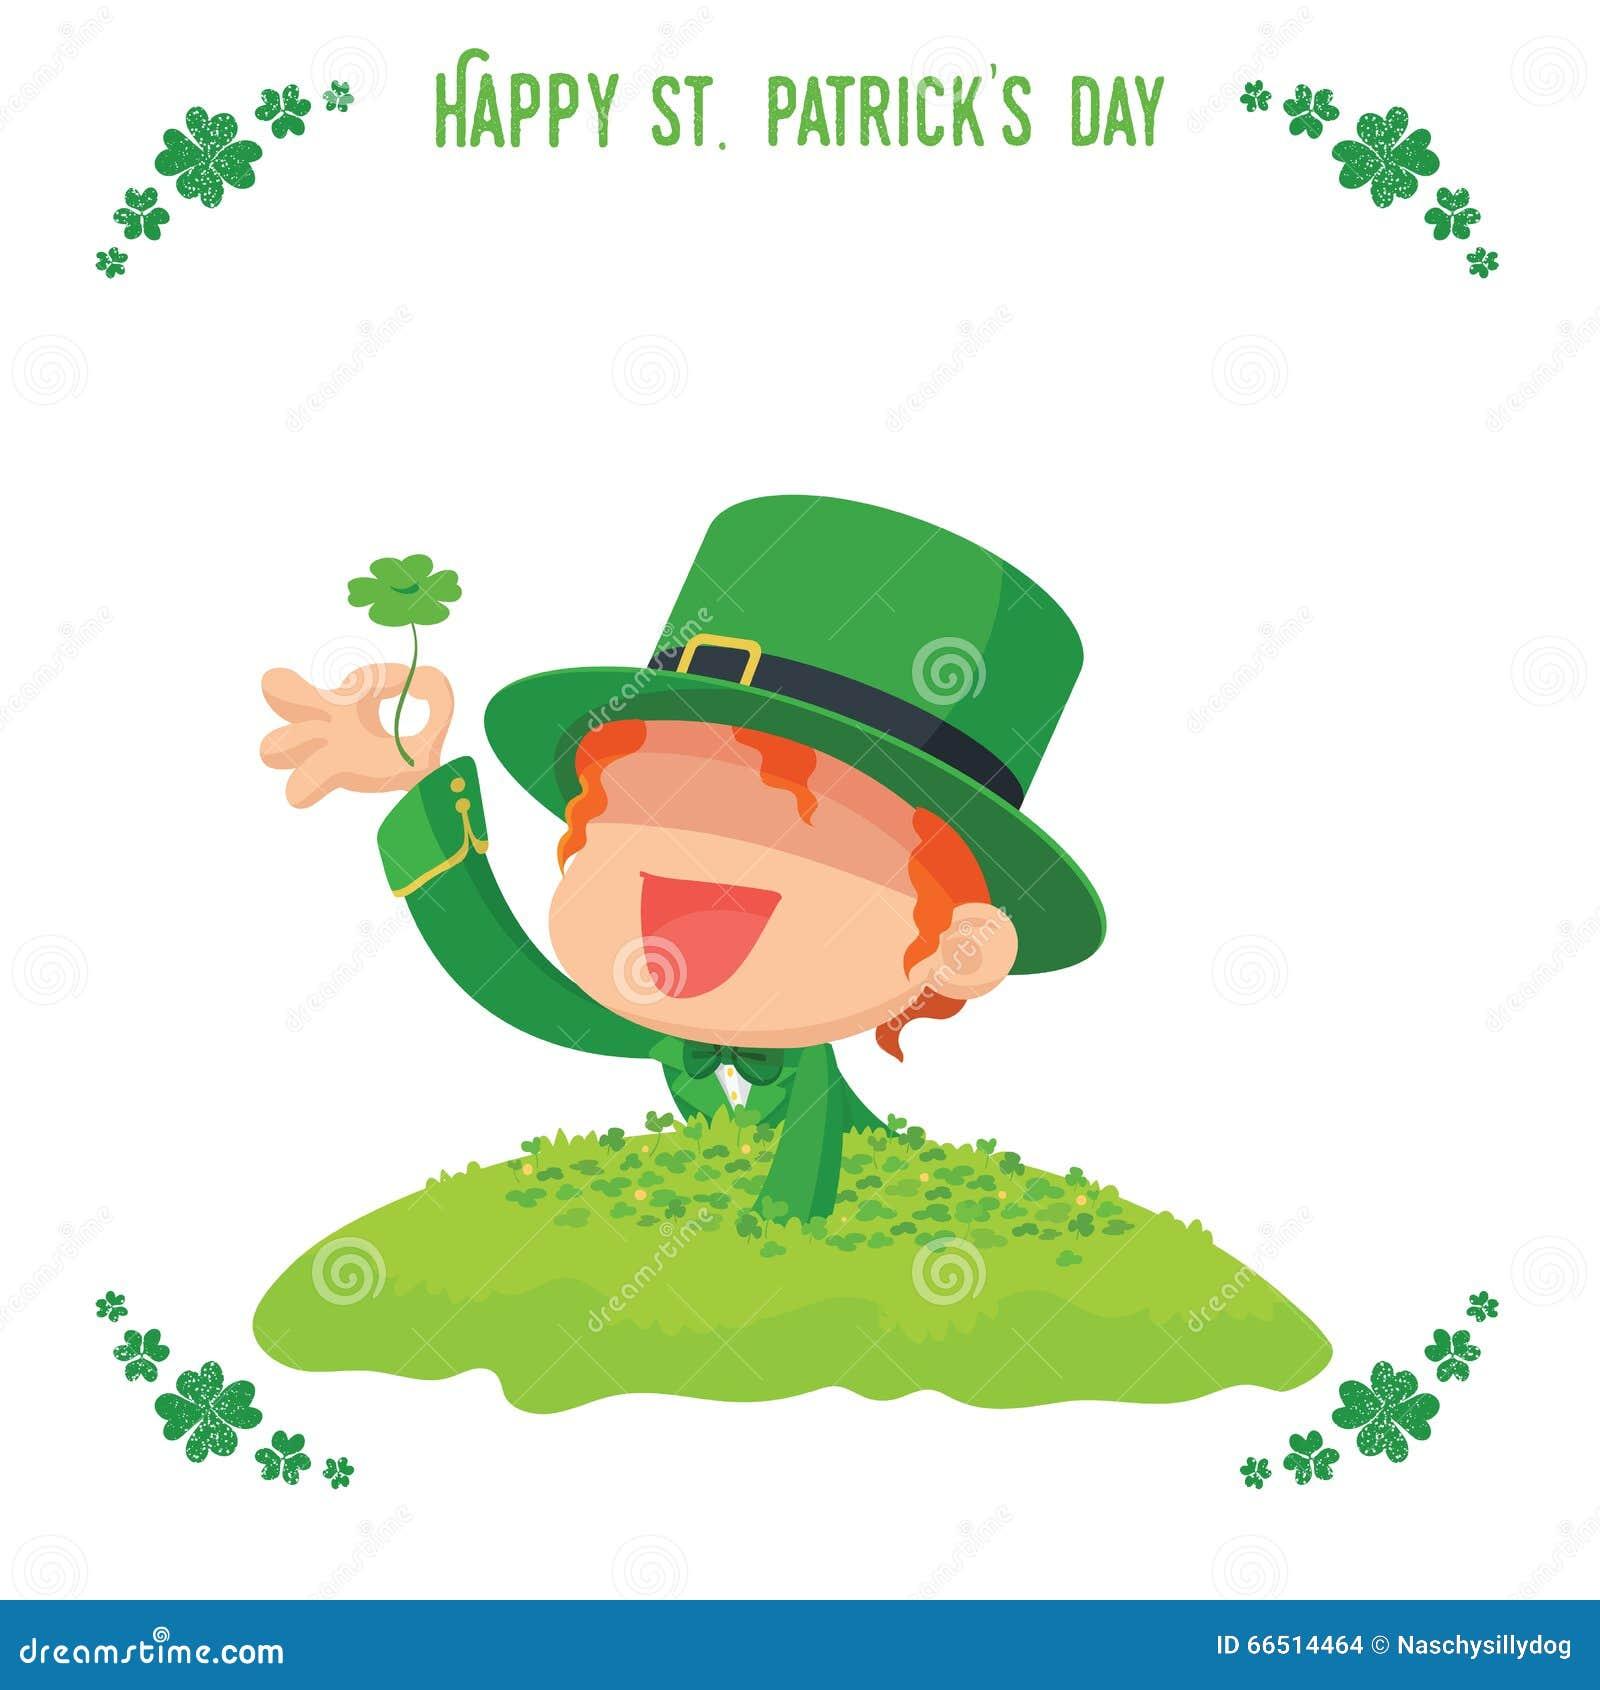 El duende encontró un trébol de cuatro hojas para la tarjeta del día de St  Patrick b5721756c62a